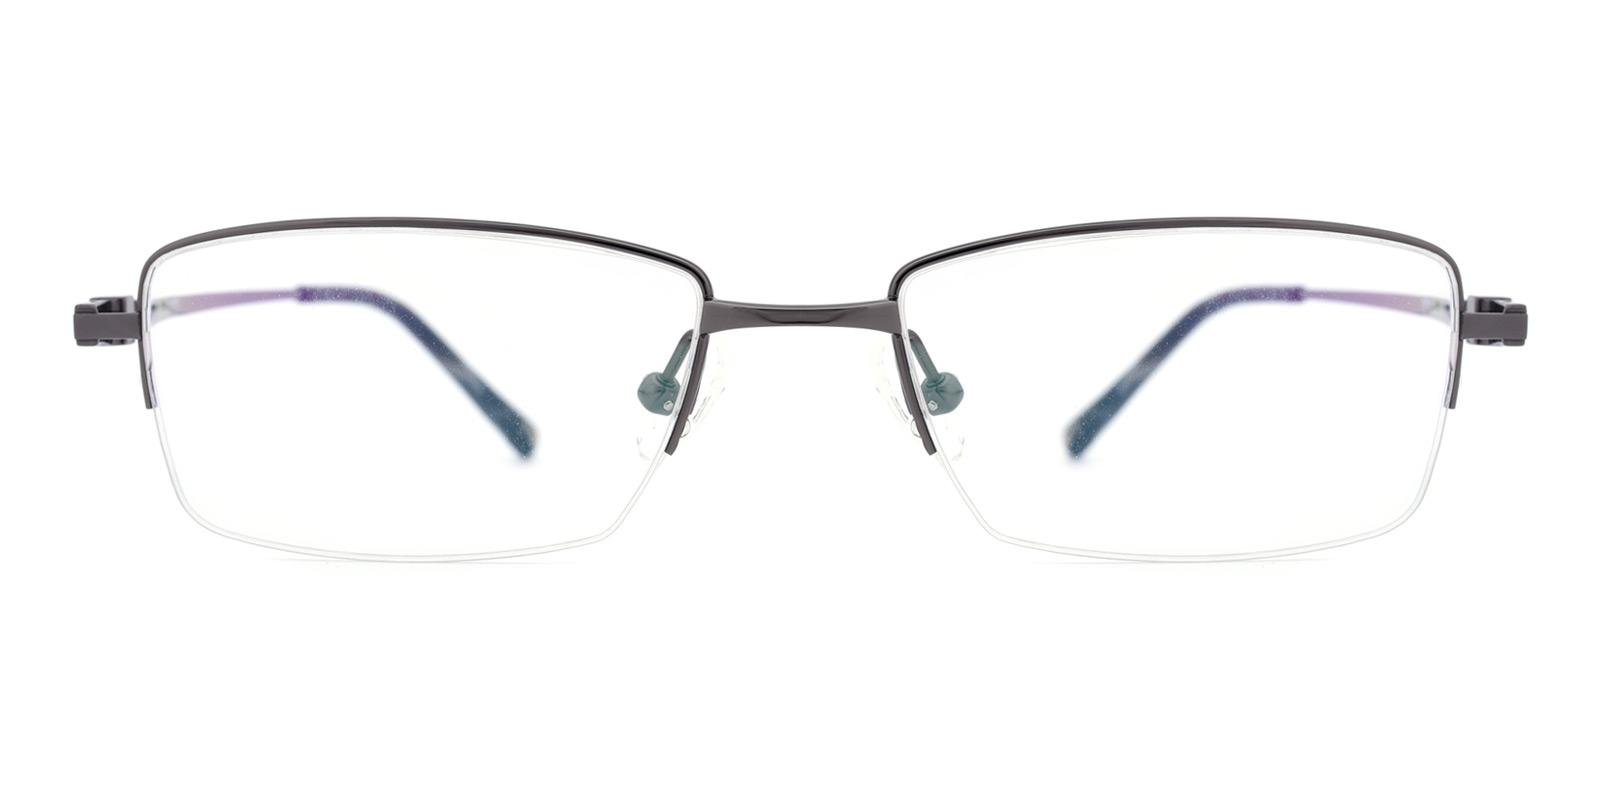 Beau-Gun-Rectangle-Titanium-Eyeglasses-detail